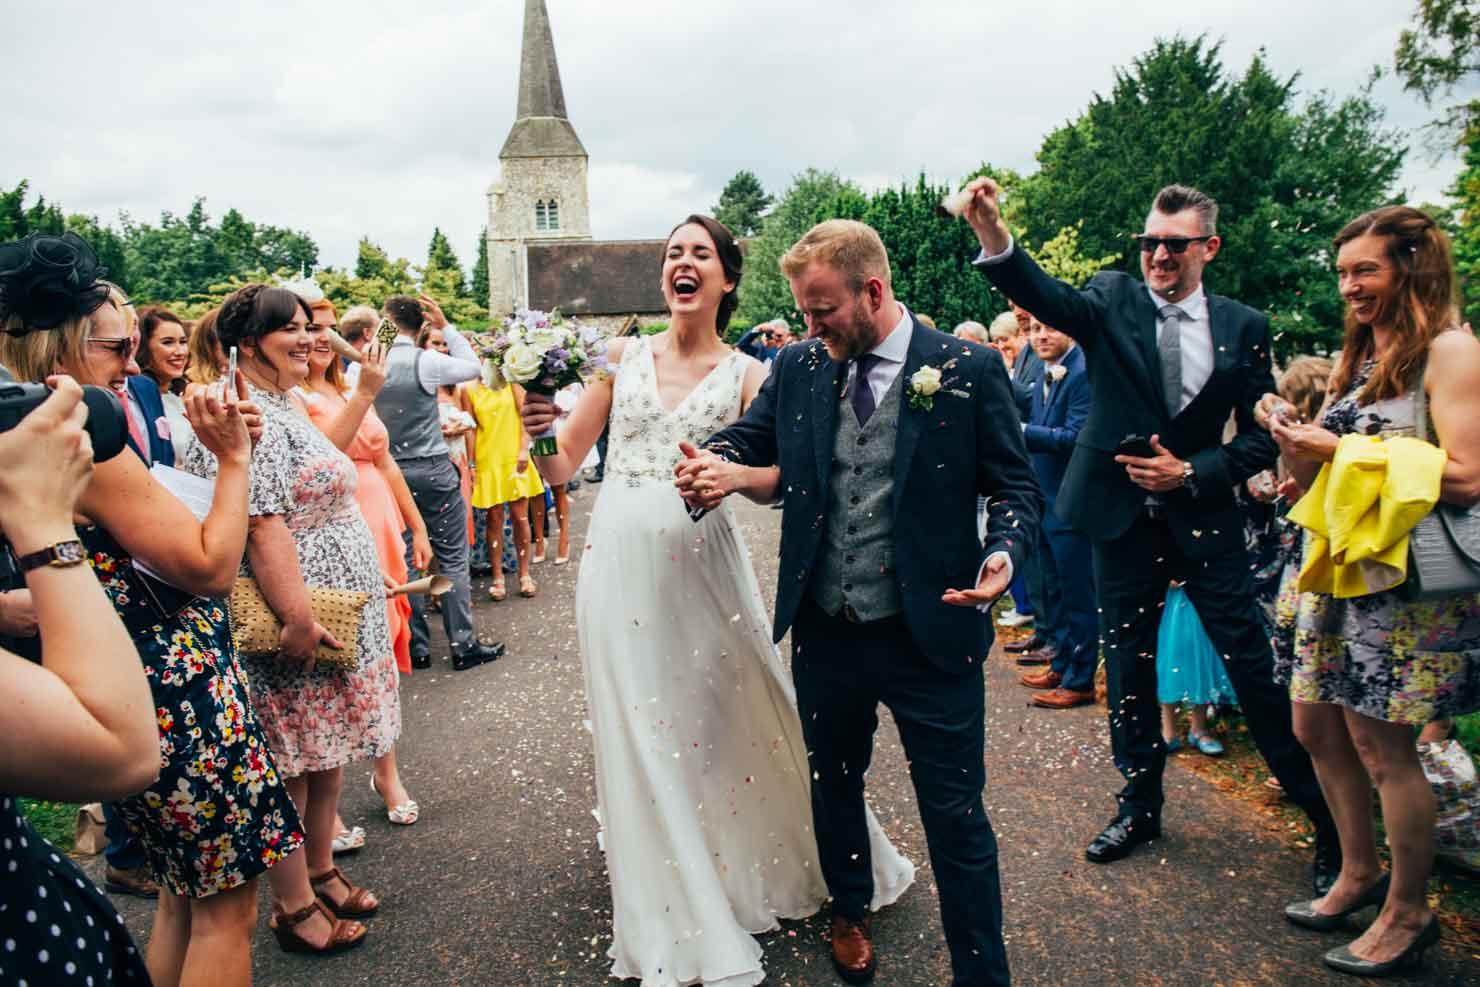 newlyweds down confetti line wedding photography in suffolk